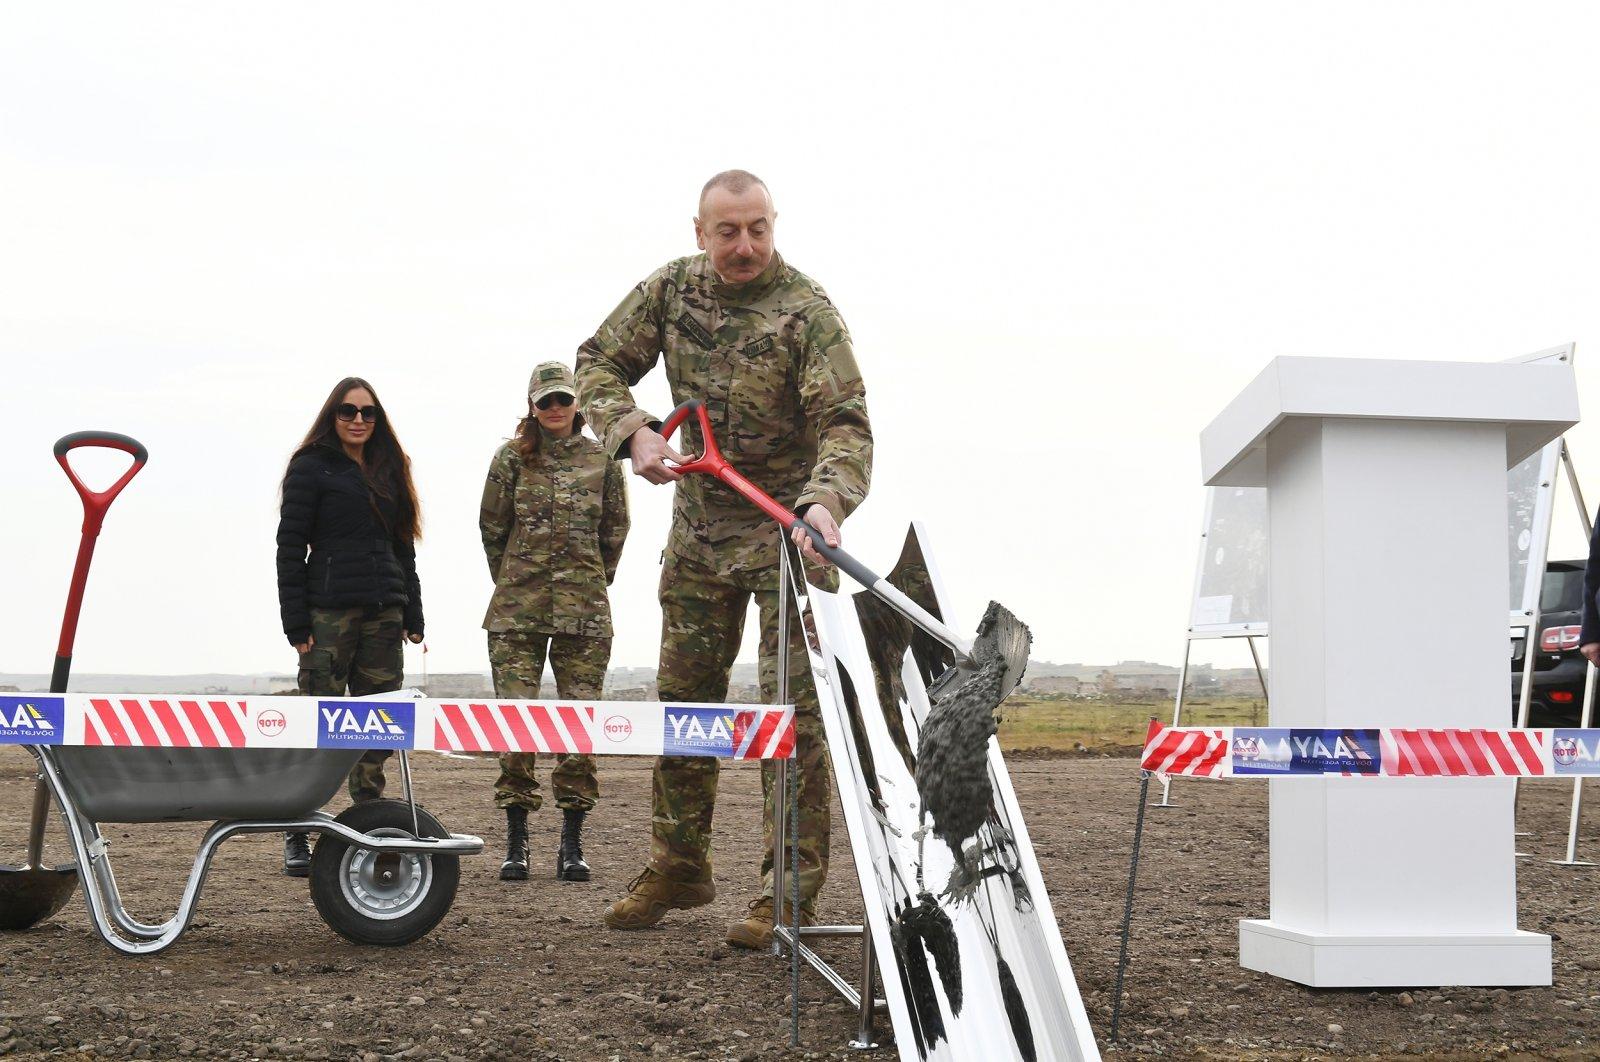 President Ilham Aliyev helps lay the foundation for the Fuzuli airport and Fuzuli-Shusha highway in a recently liberated area of Fuzuli district, Azerbaijan, Jan. 14, 2021. (AA Photo)